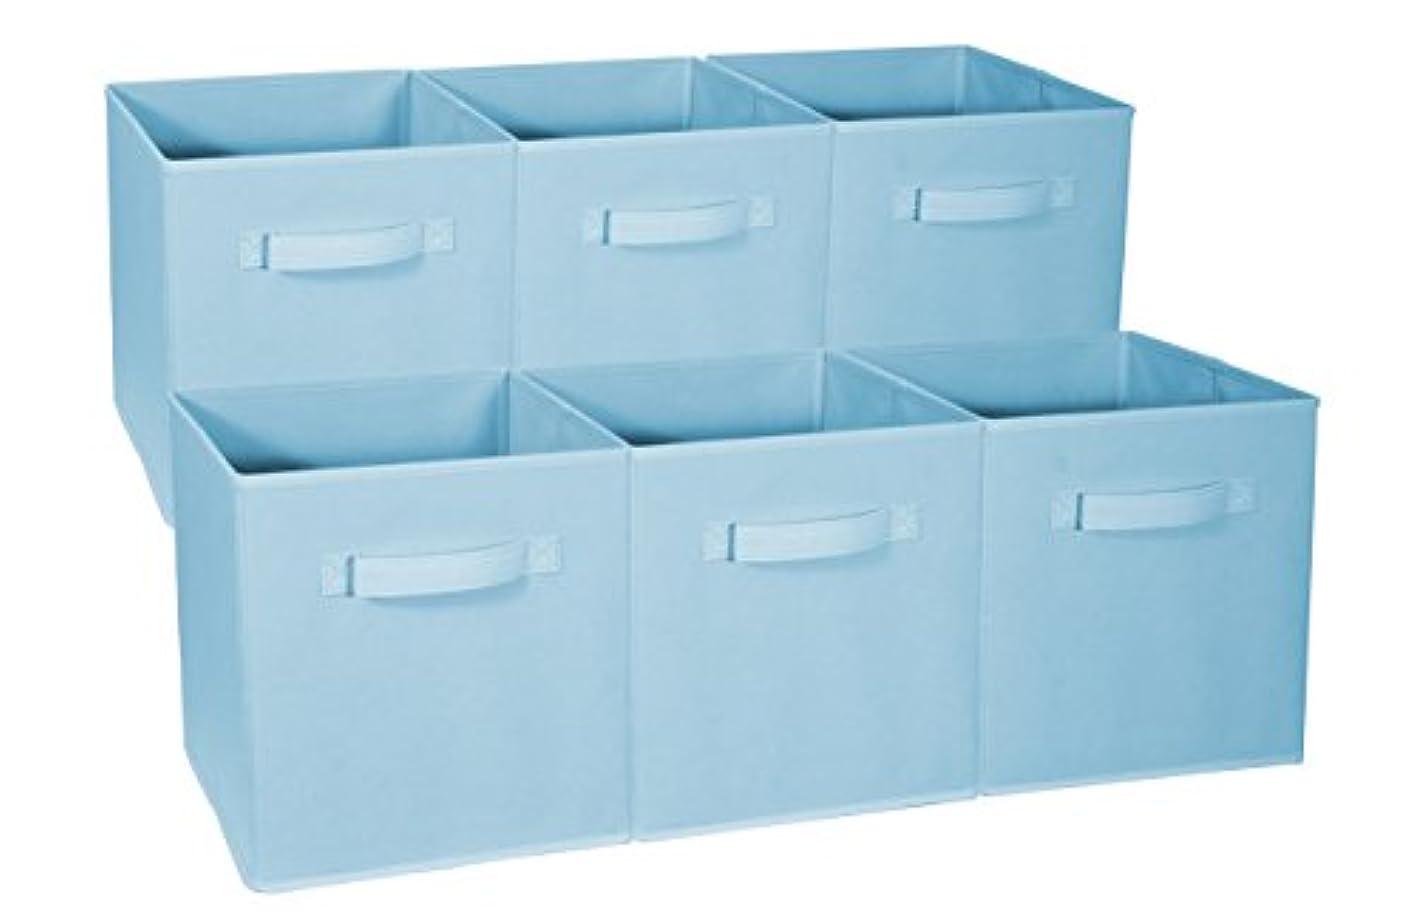 Sorbus Foldable Storage Cube Basket Bin - Great for Nursery, Playroom, Closet, Home Organization (Pastel Blue, 6 Pack)